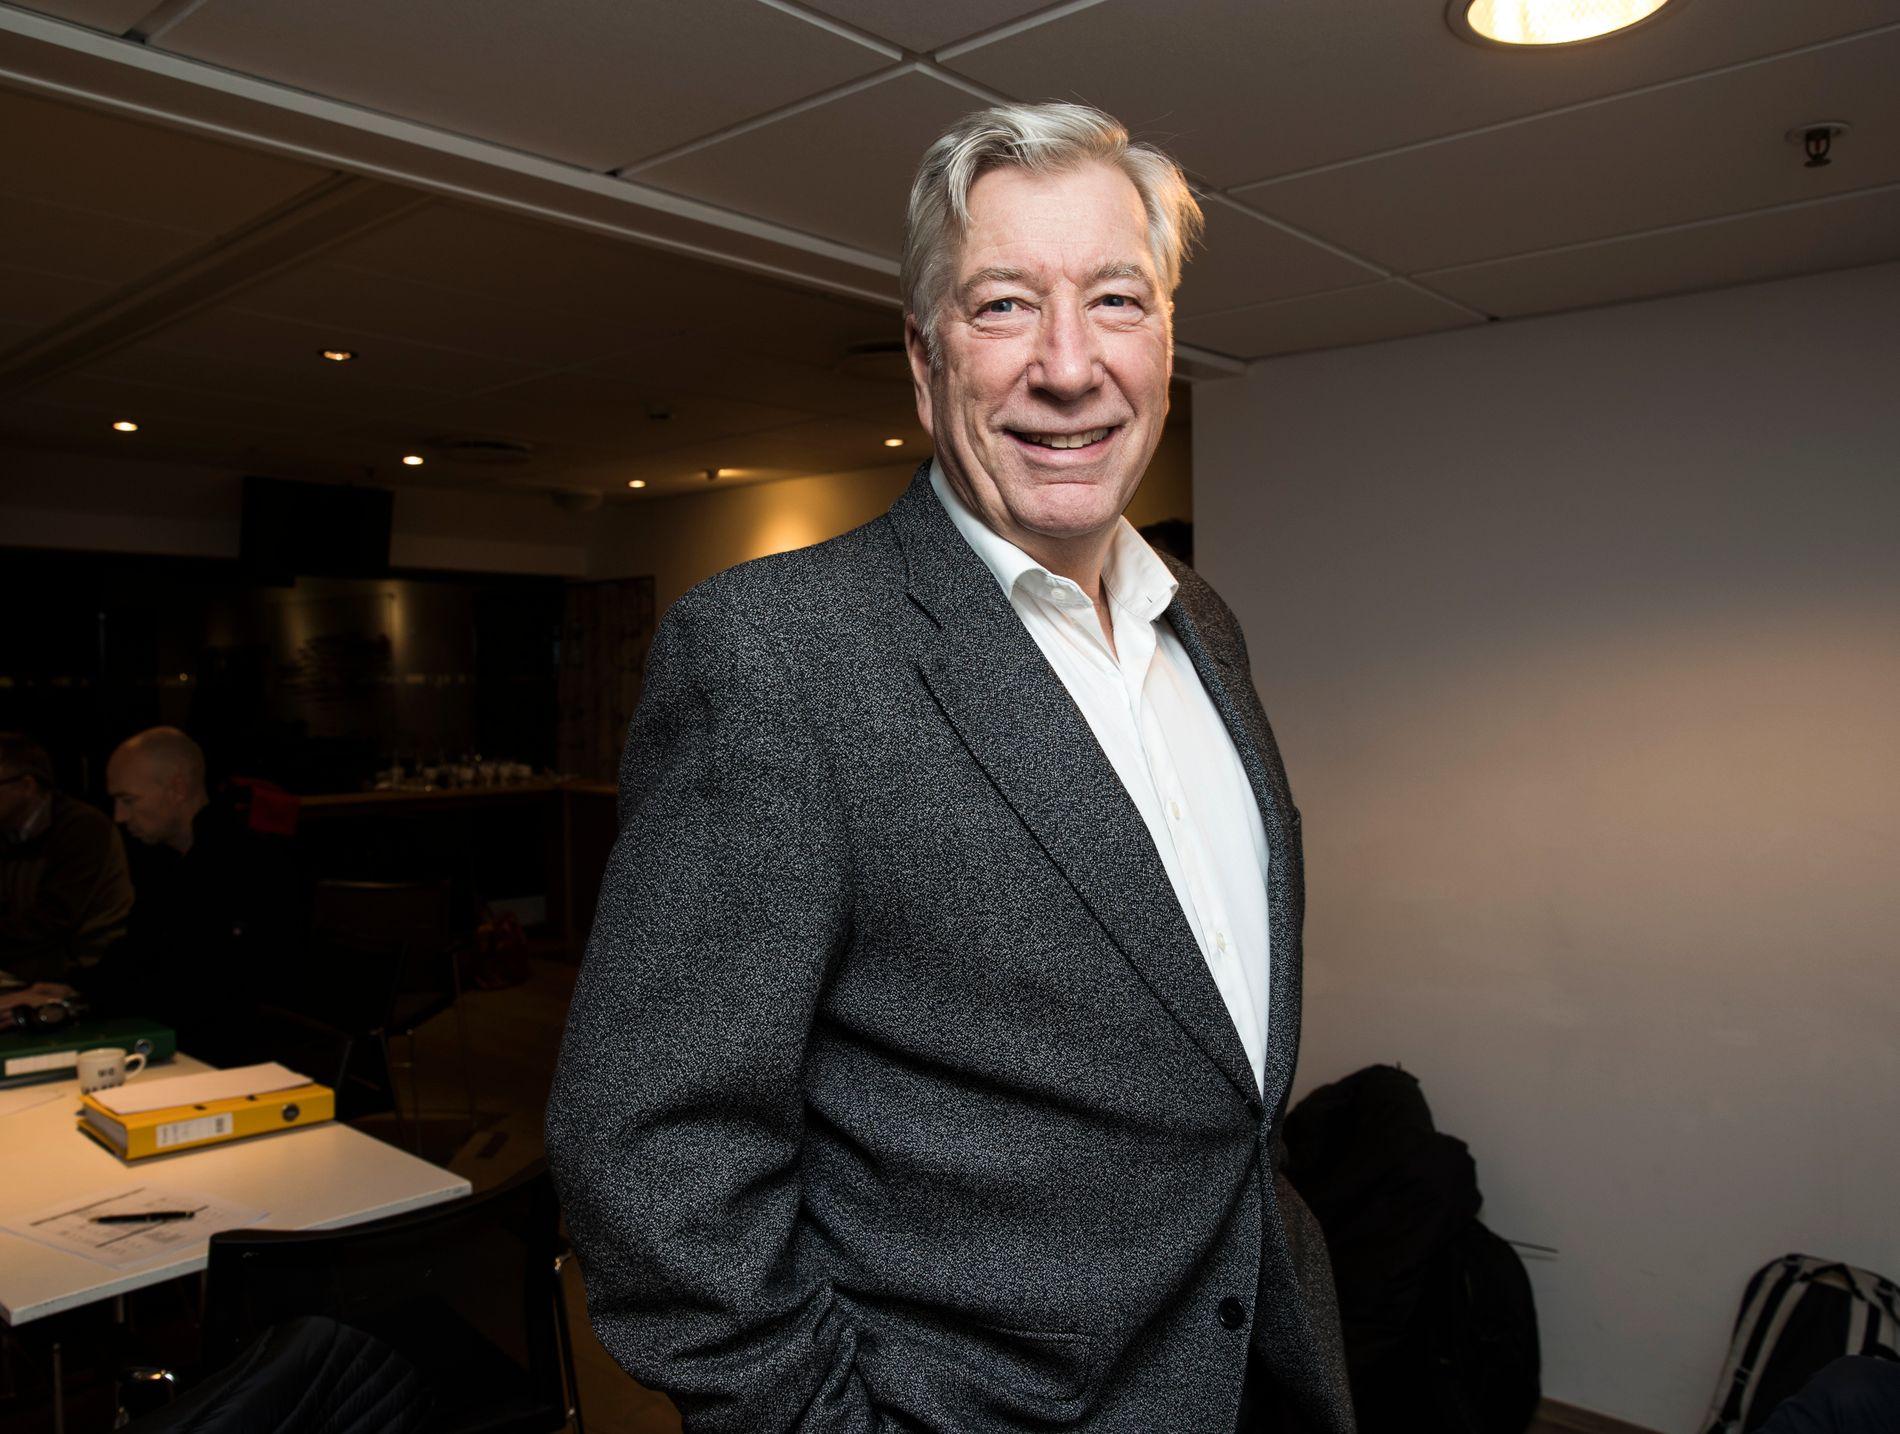 BEKLAGER: Sigbjørn Johnsen er fylkesmann i Hedmark.